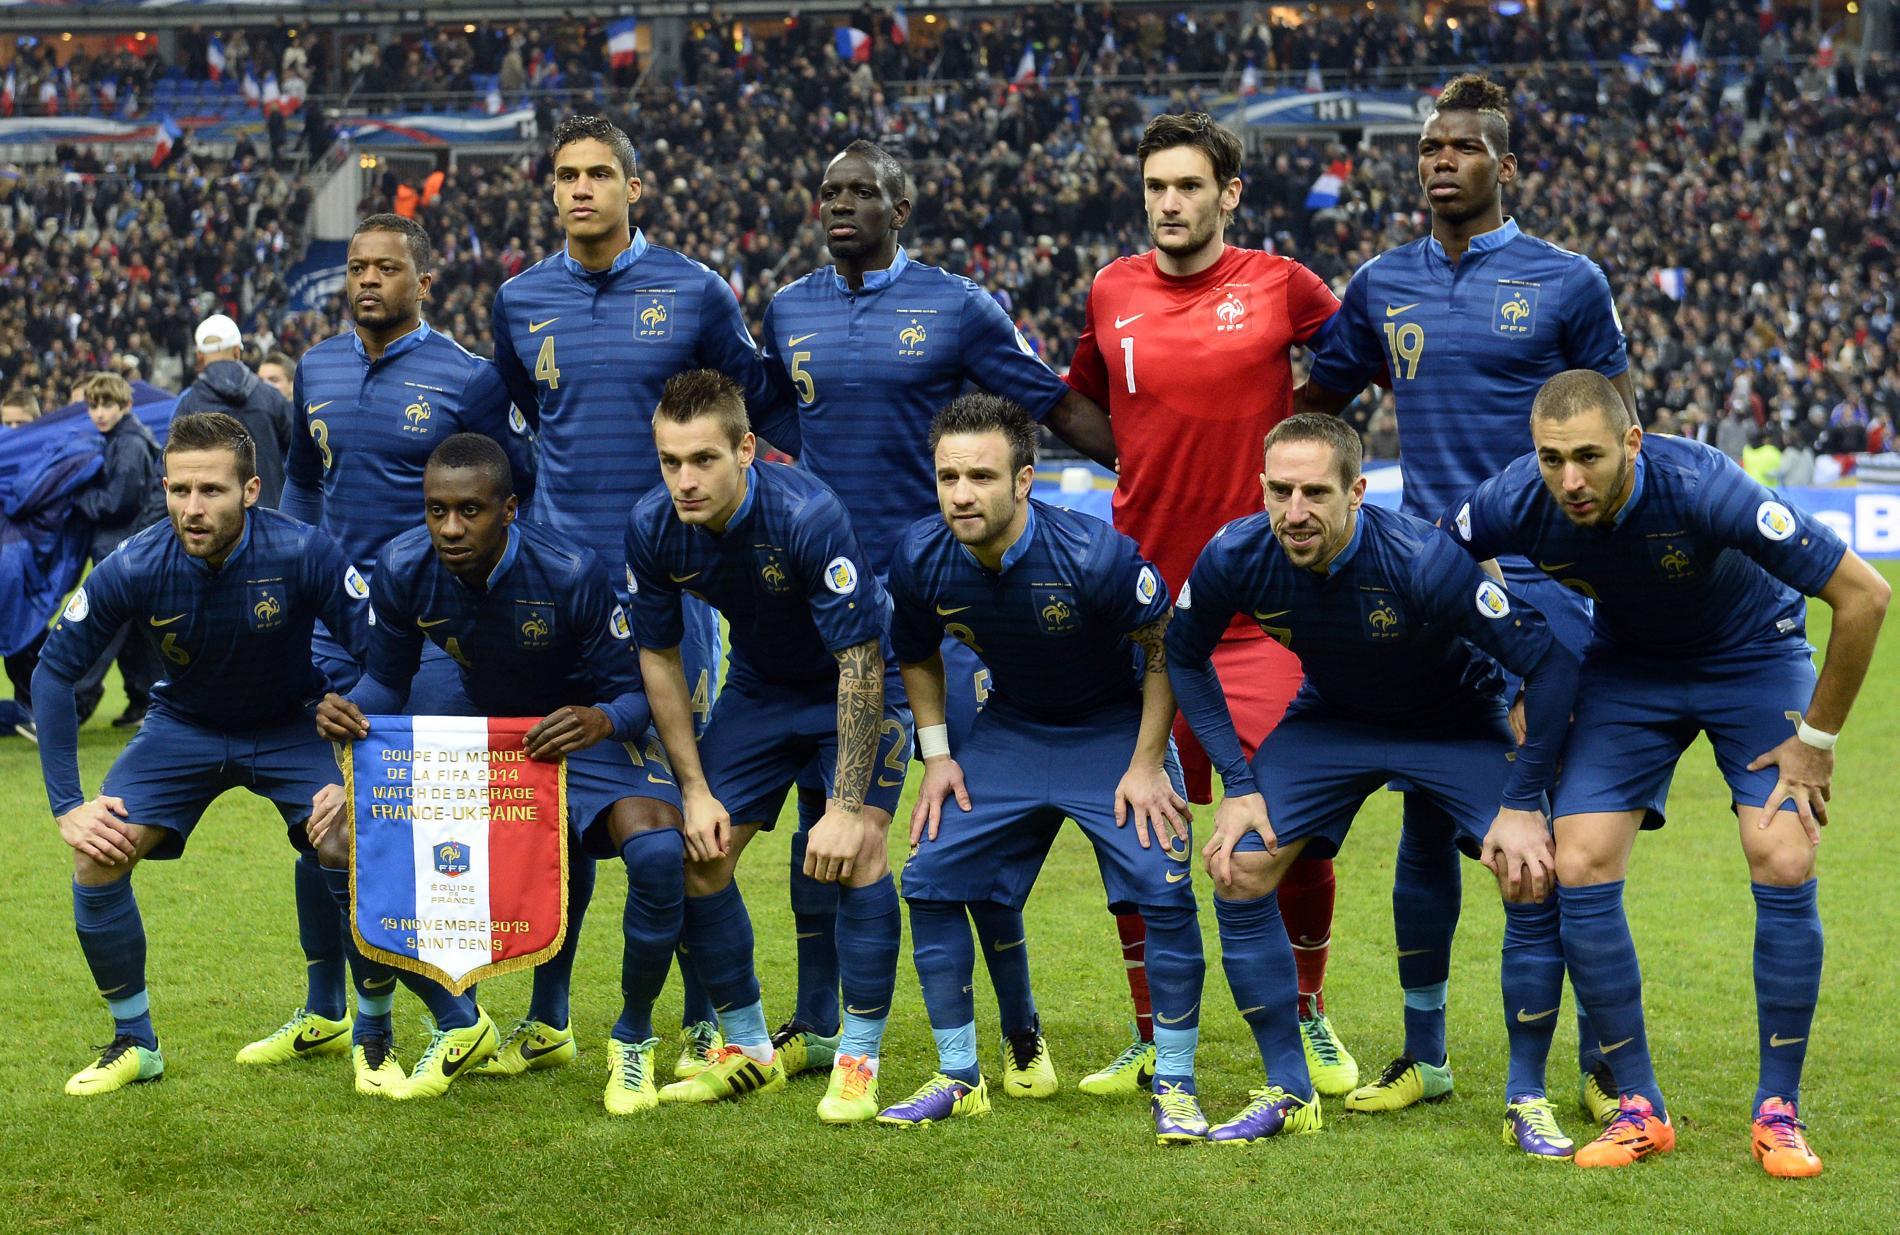 France Foot 4